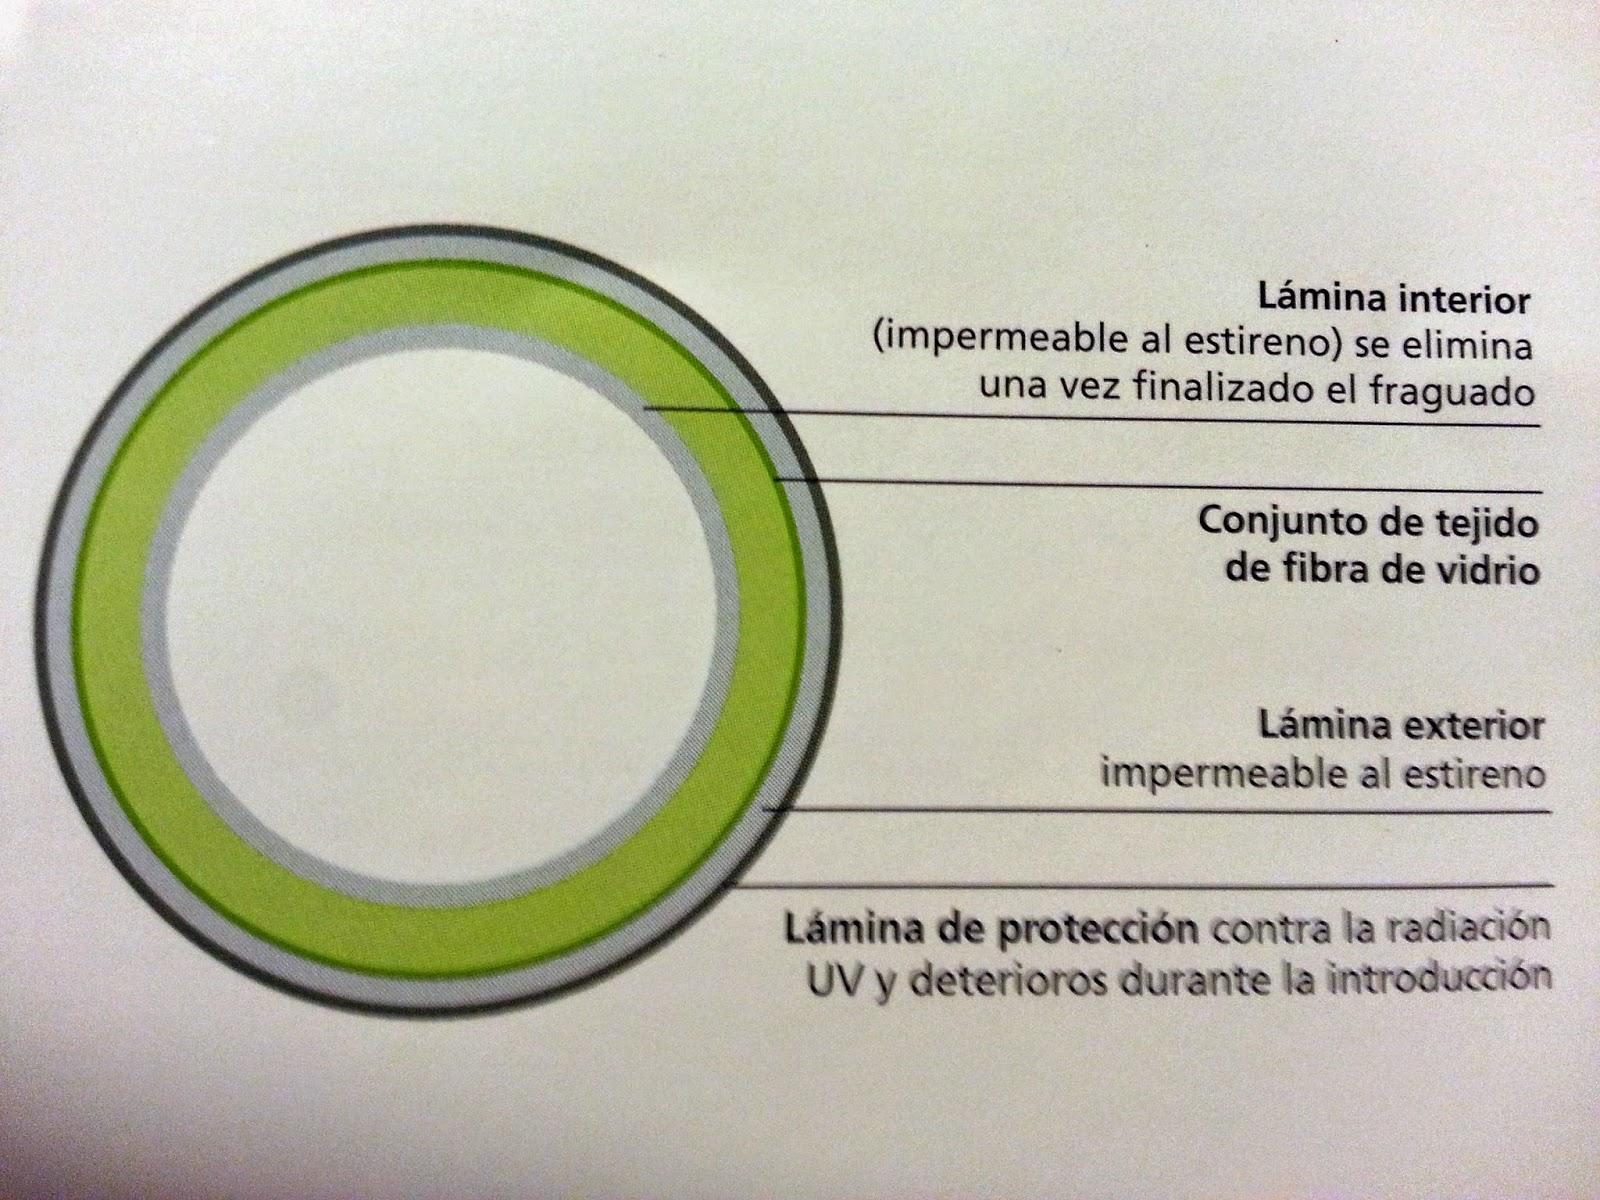 Pocería sin zanja: conozca lo último en manga de fibra de vidrio